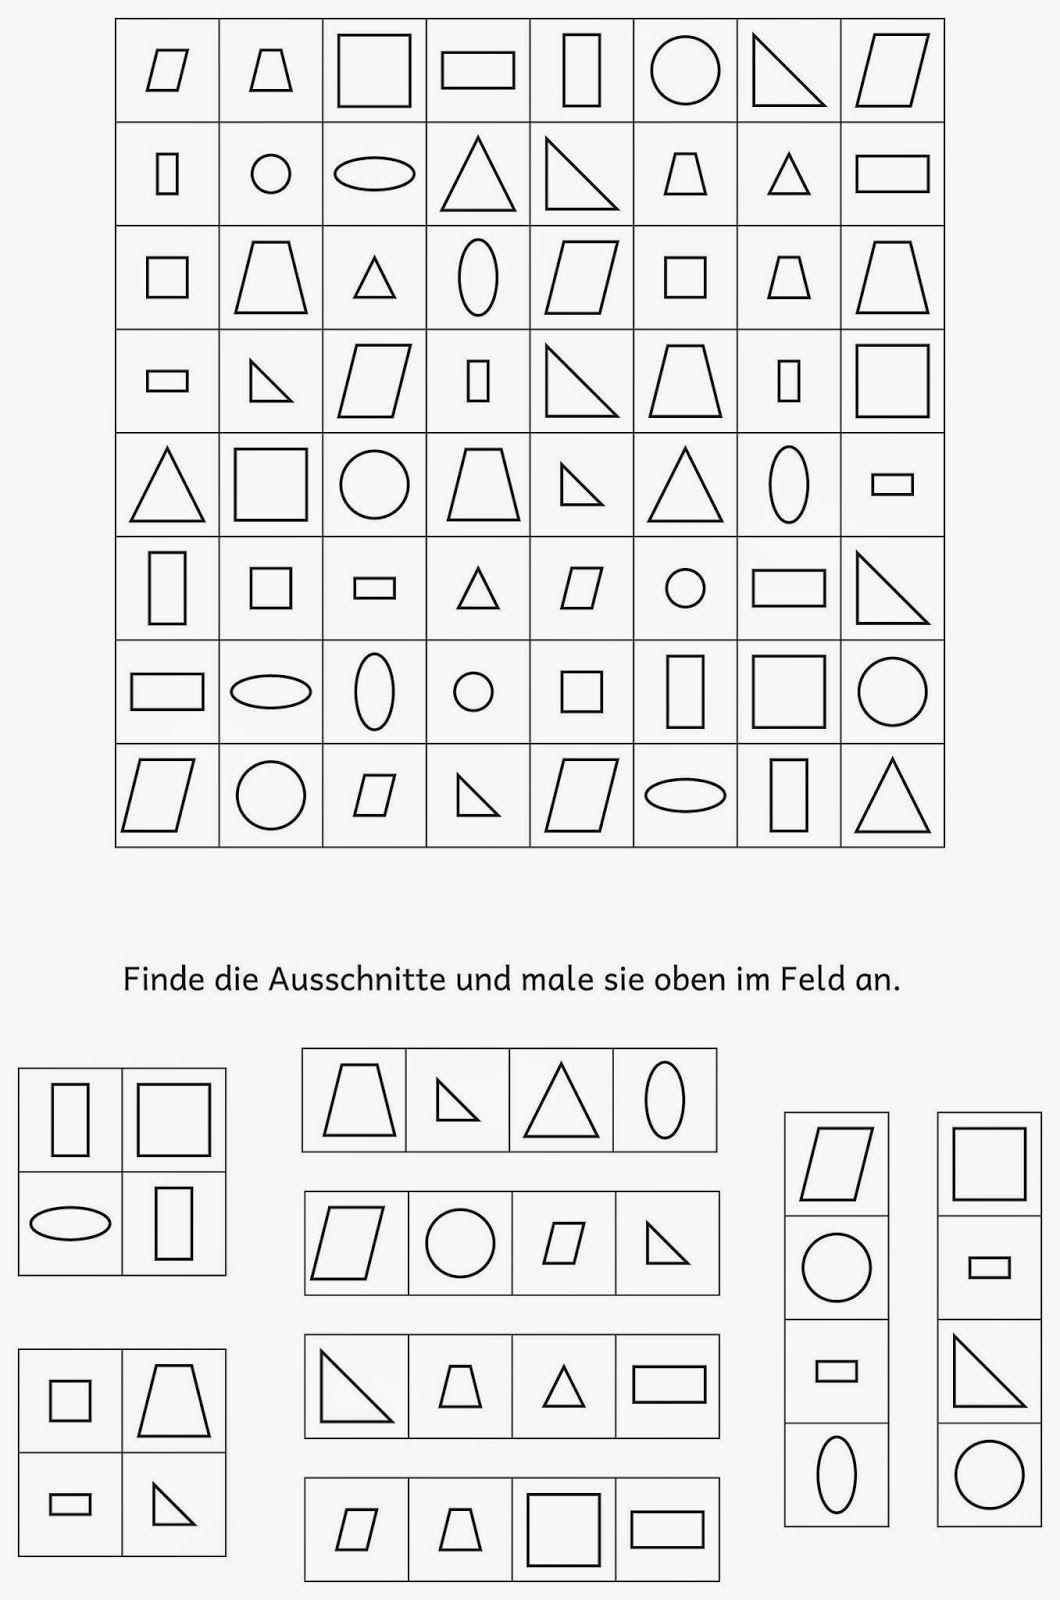 lernst bchen visuelle wahrnehmung figura fondo pinterest kindergarten busy bags and phonics. Black Bedroom Furniture Sets. Home Design Ideas